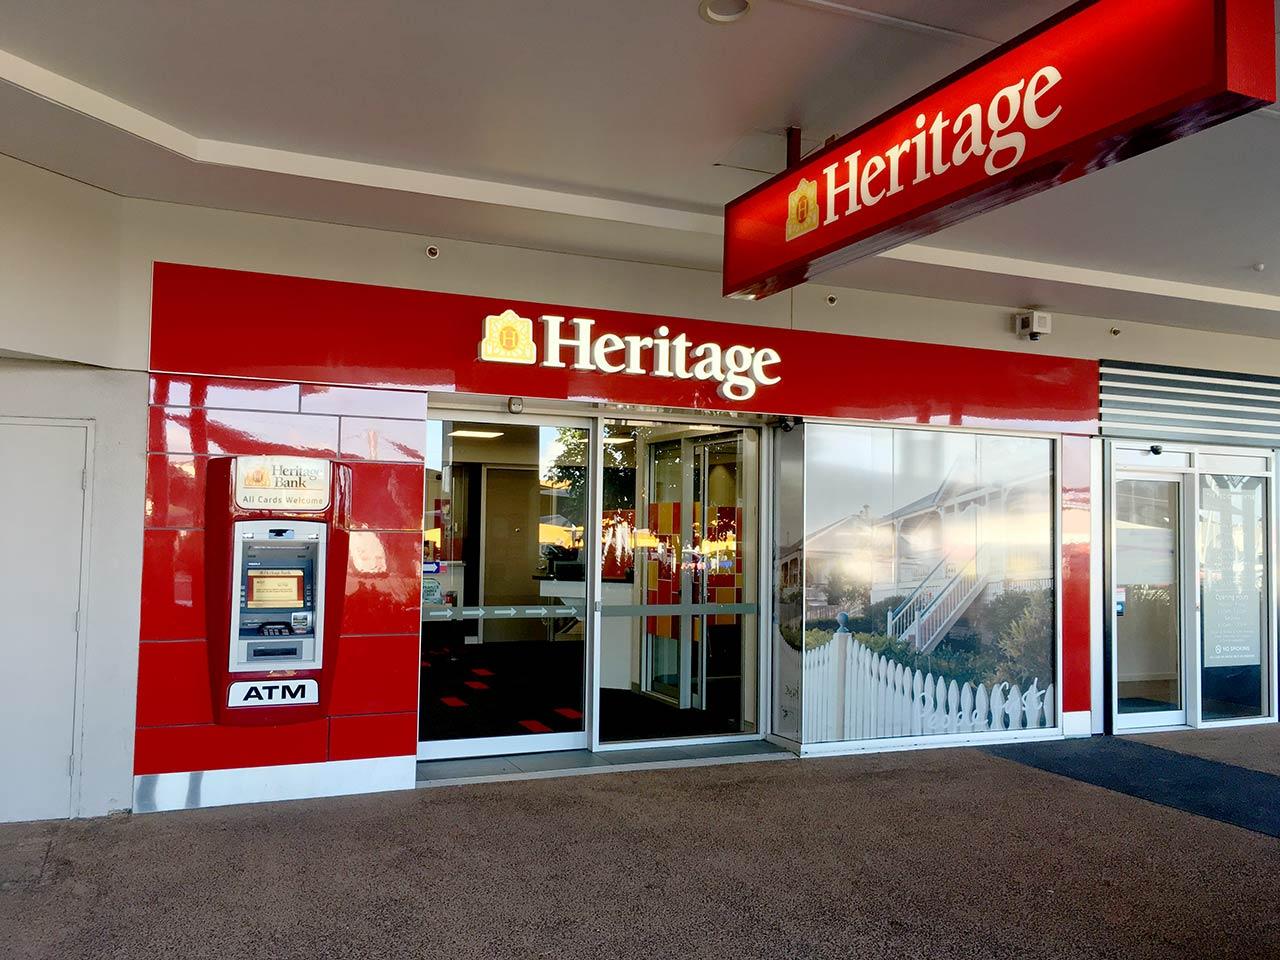 Heritage Bank - Hervey Bay, QLD 4655 - (07) 4124 2899   ShowMeLocal.com